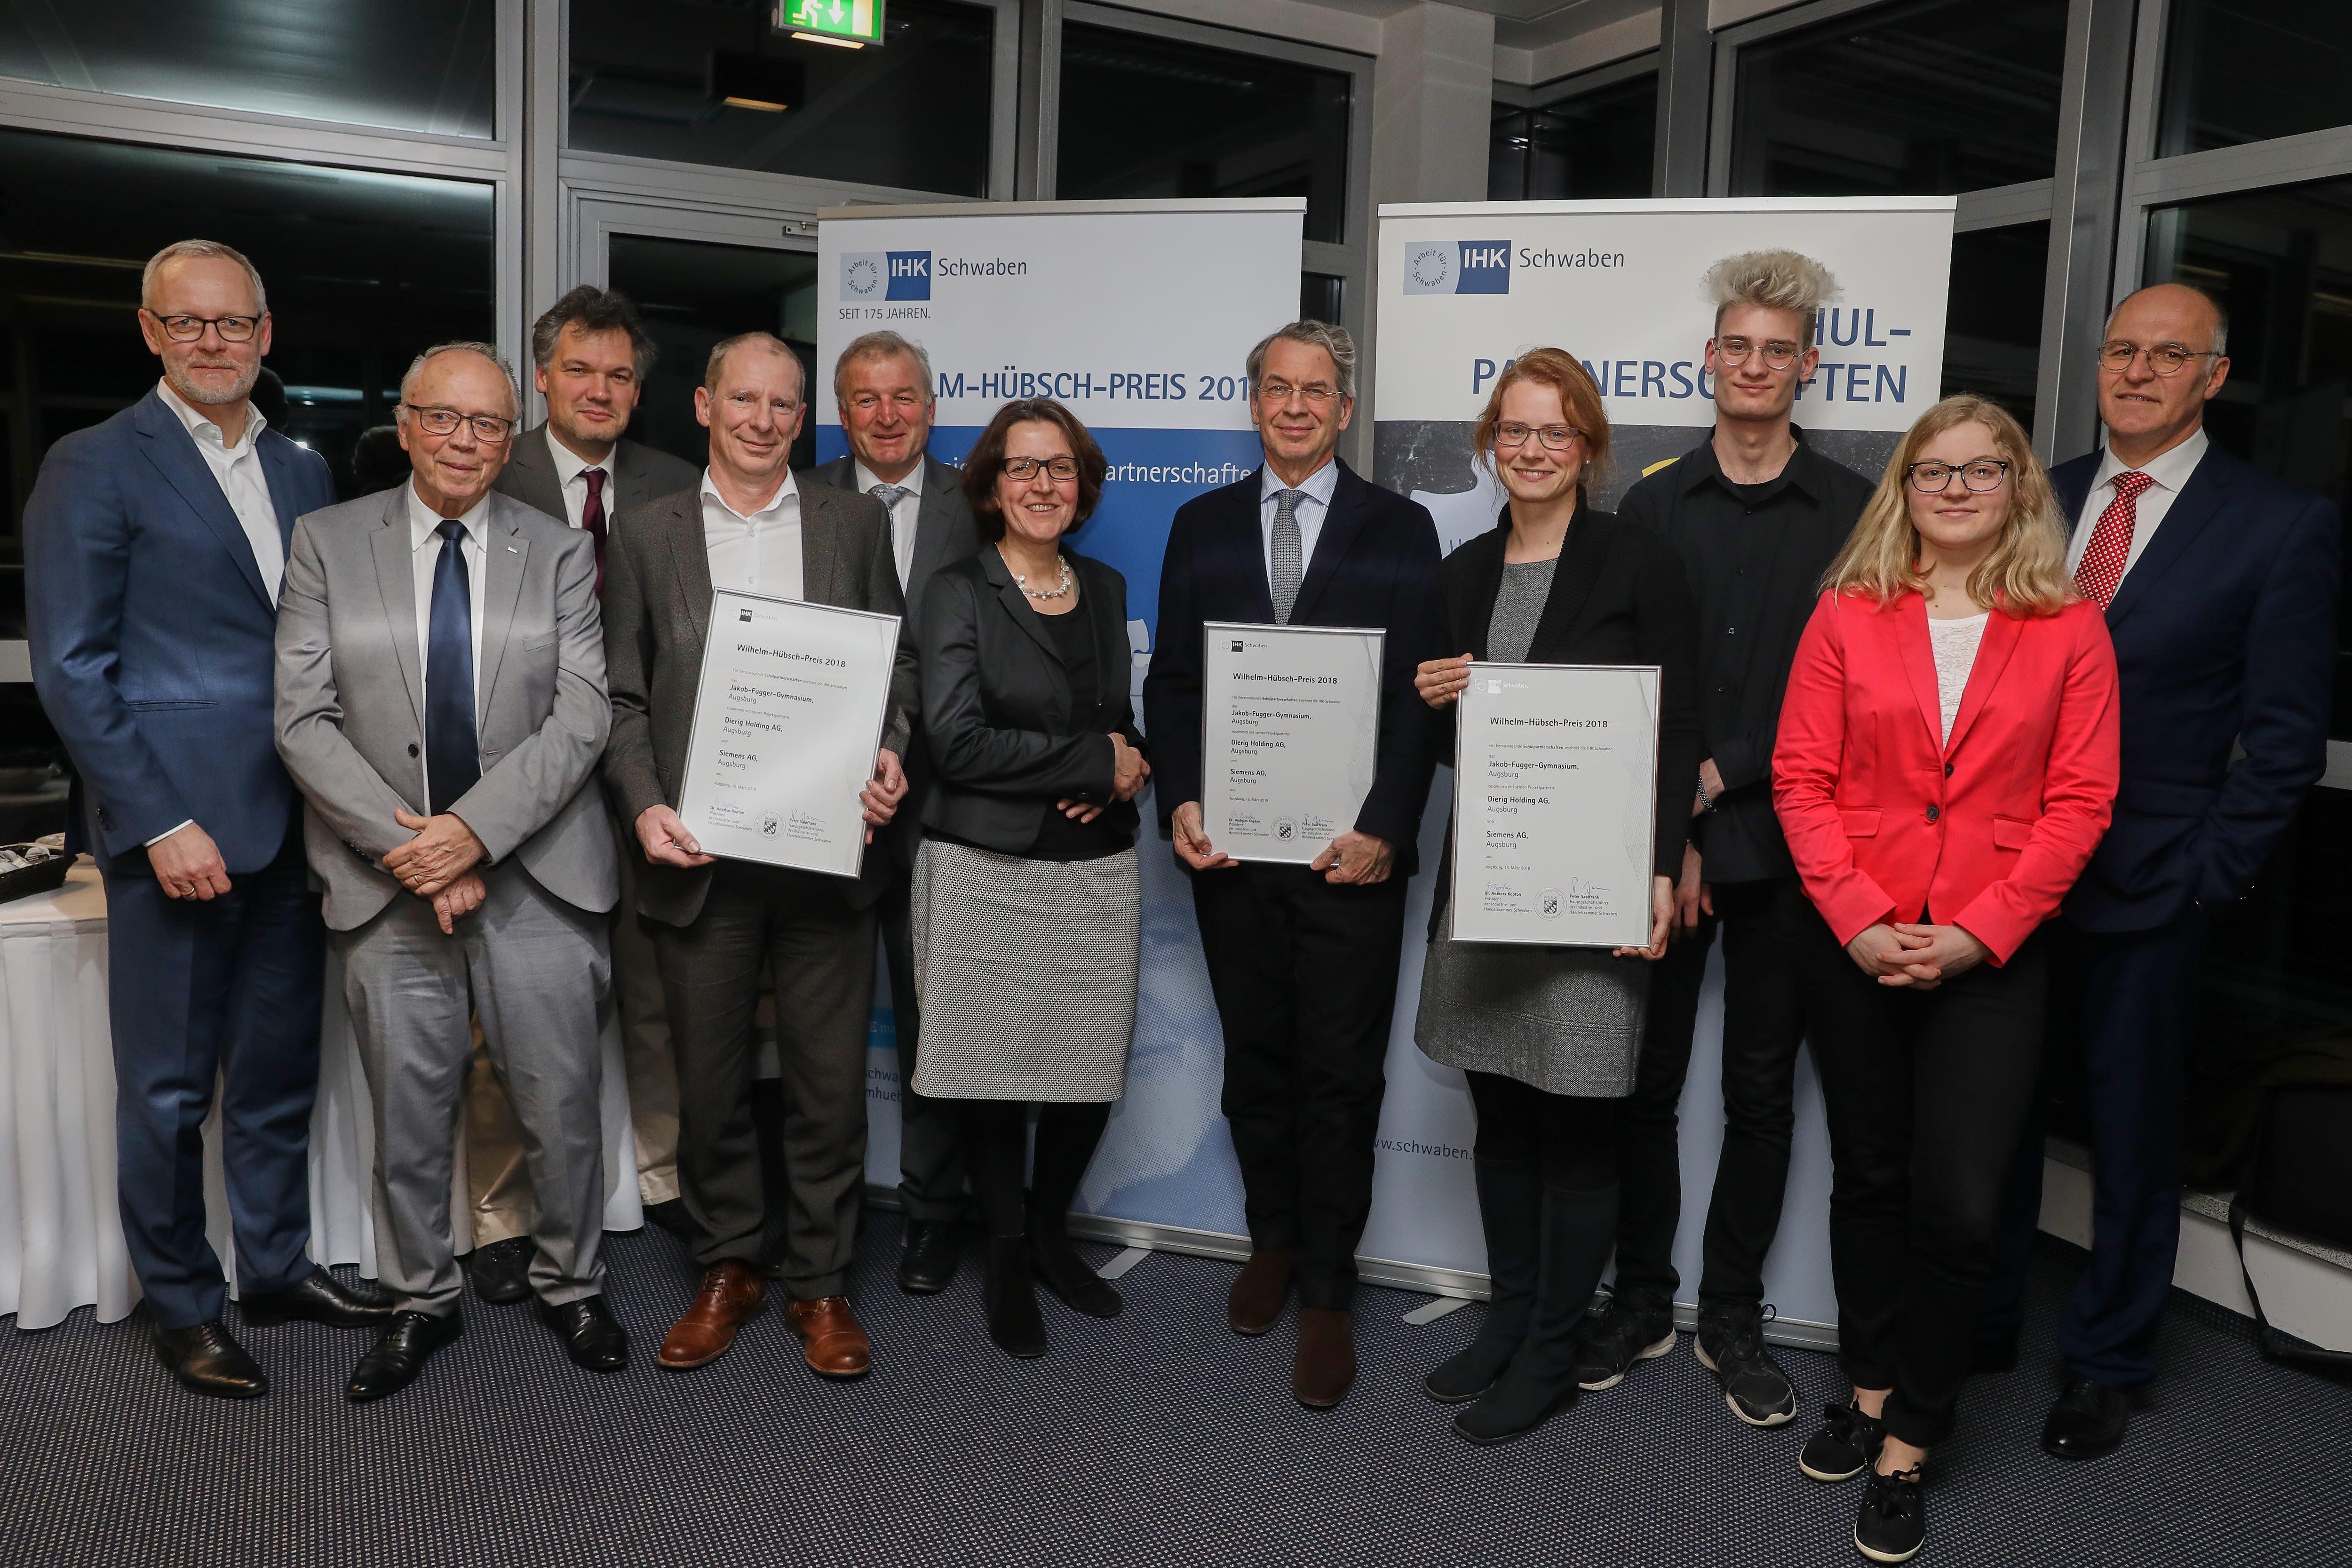 Deutschland, Augsburg, 15.03.2018, Wilhelm-Hübsch-Preis Verleihung bei der Fa. UPM, Sophie Cronenberg 4.v.r., Wolfgang Schreck 2.v.l., Jörg Haas 3.v.l., Schulleiter Wilhelm Kugelmann 5.v.l. und Angelika Felber 6.v.l. (alle Jakob-Fugger-Gymnasium), Bernhard Manzl (Siemens AG) 4.v.l., Christian Dierig (Dierig Holding AG) 5.v.r., Dr. Markus Litpher (IHK Regionalvorsitzender) und OB Dr. Kurt Gribl re.